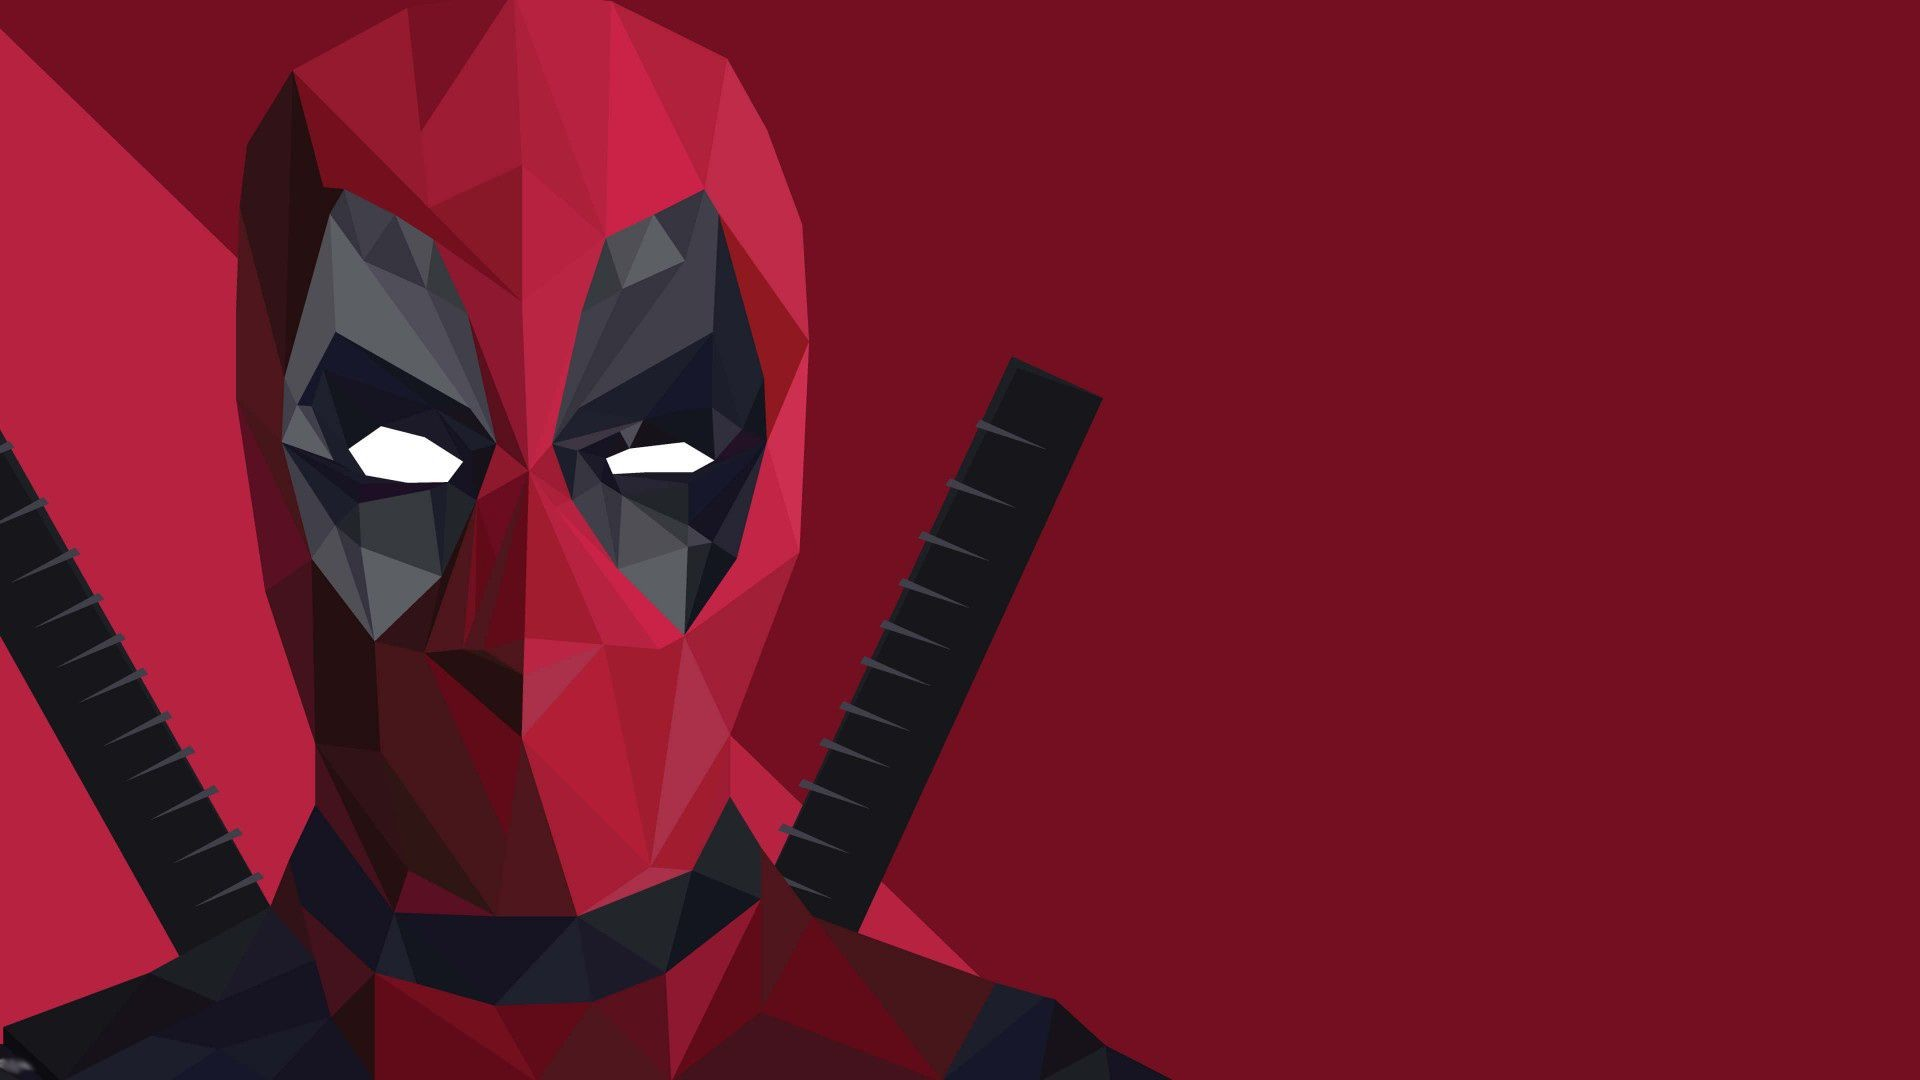 Res: 1920x1080, Deadpool Low Poly Wallpaper HD